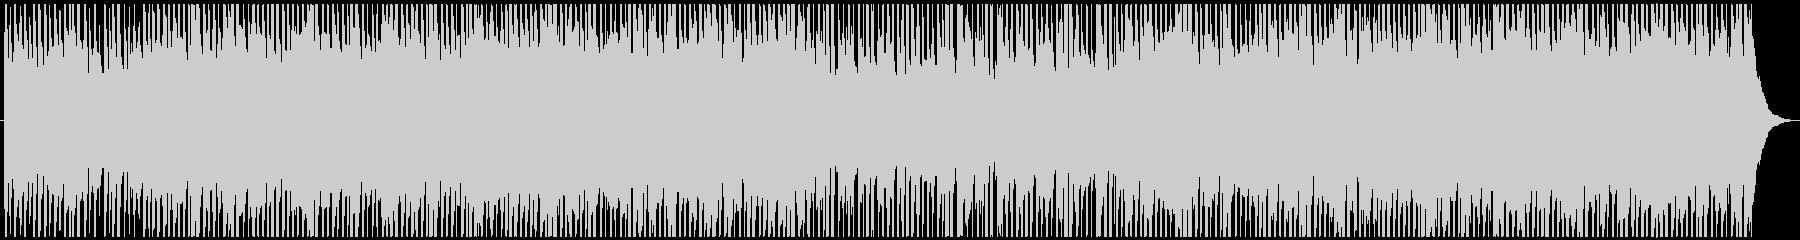 Gentle Happy Upbeat Pop's unreproduced waveform